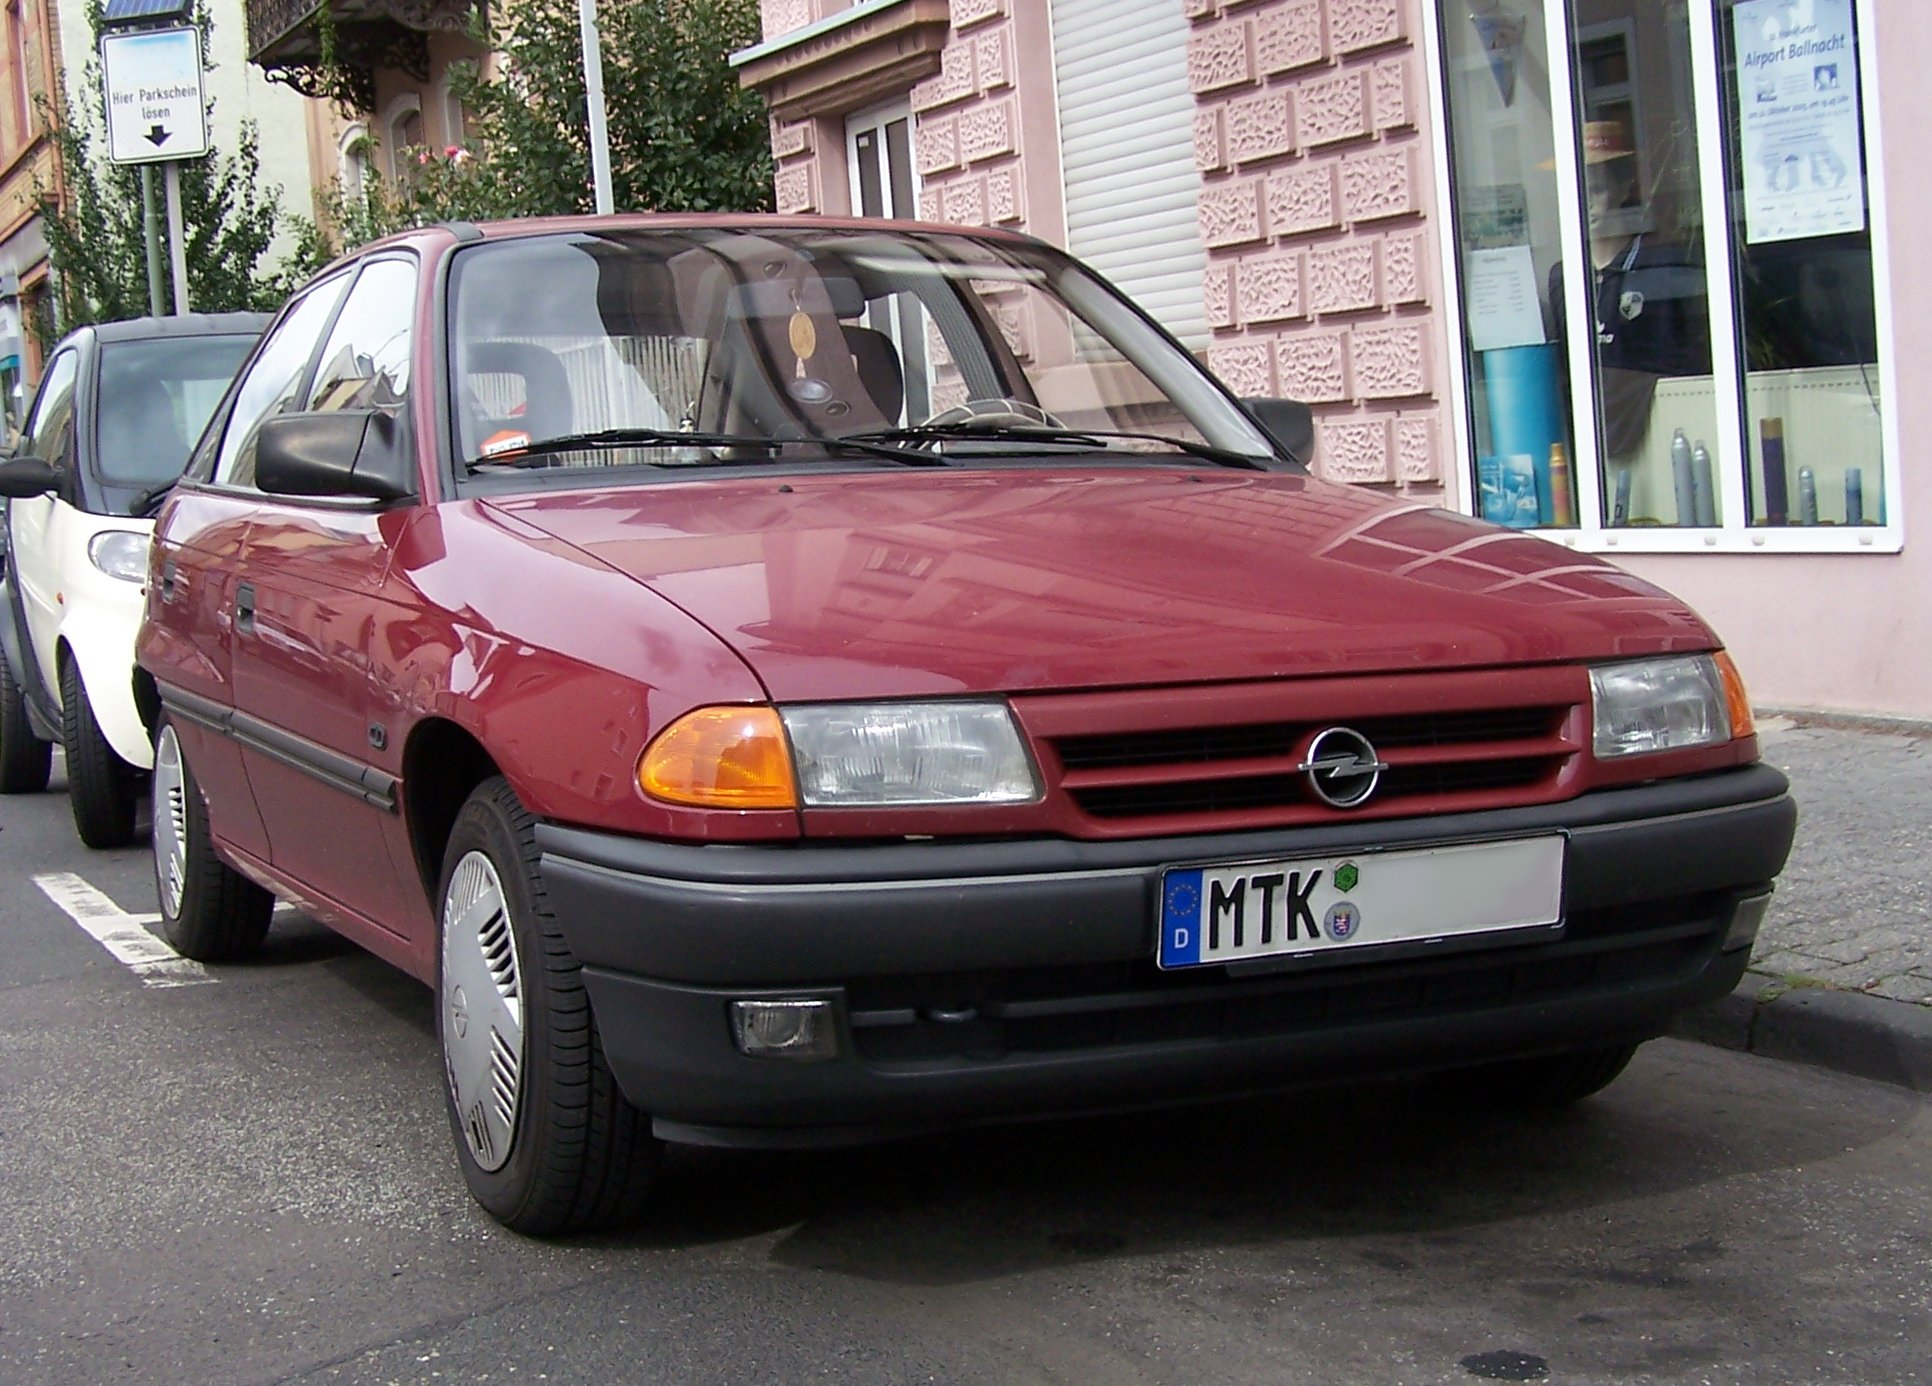 OPEL ASTRA F 2.0i 115PS 1991-1996 Katalysator